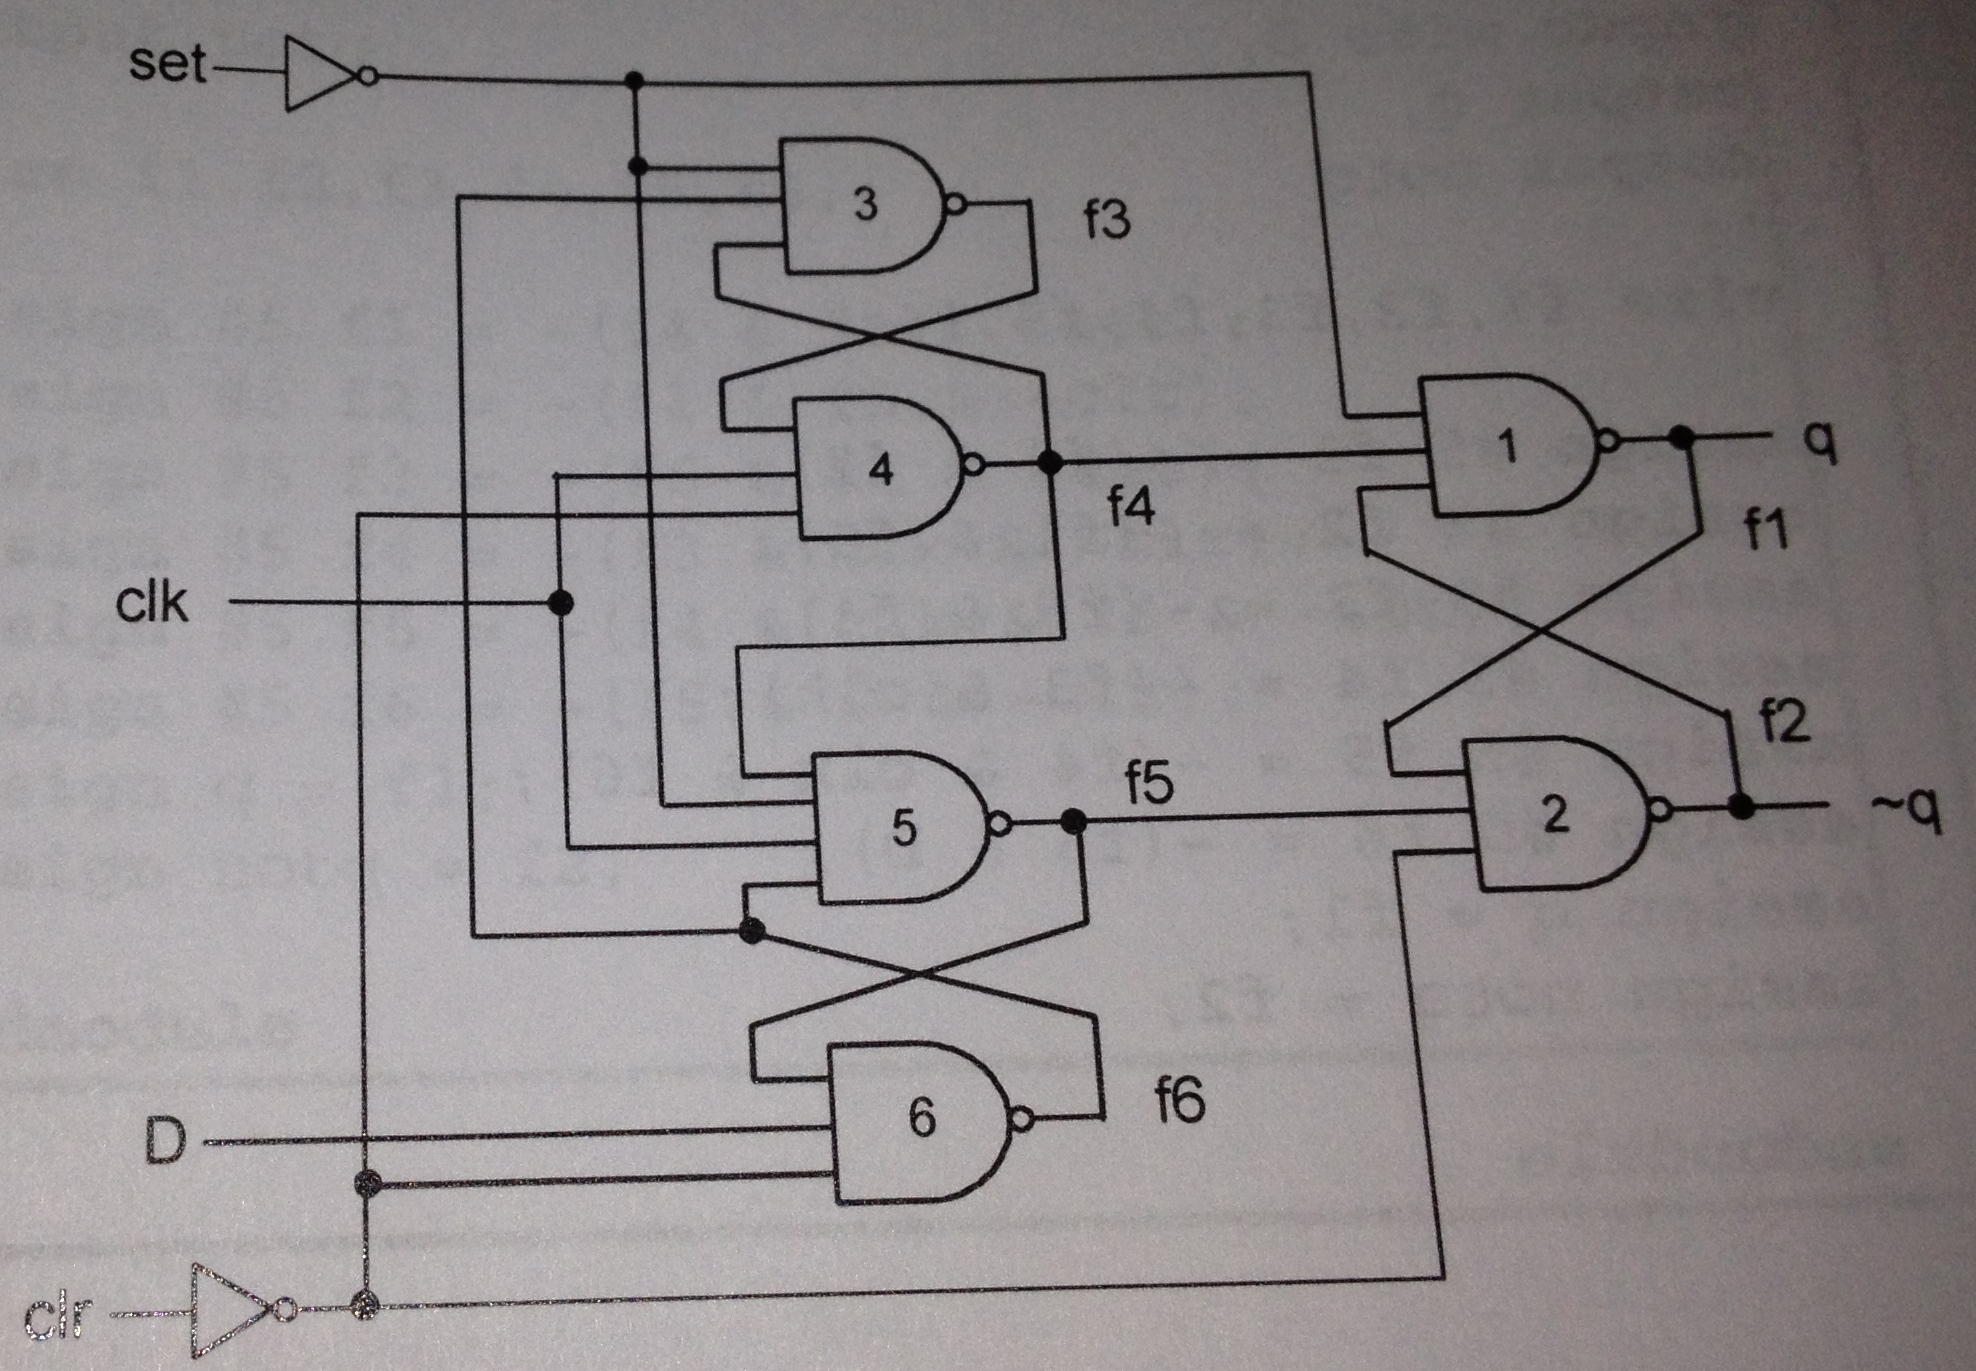 hight resolution of  d flip flop circuit is shown below fig 7 7